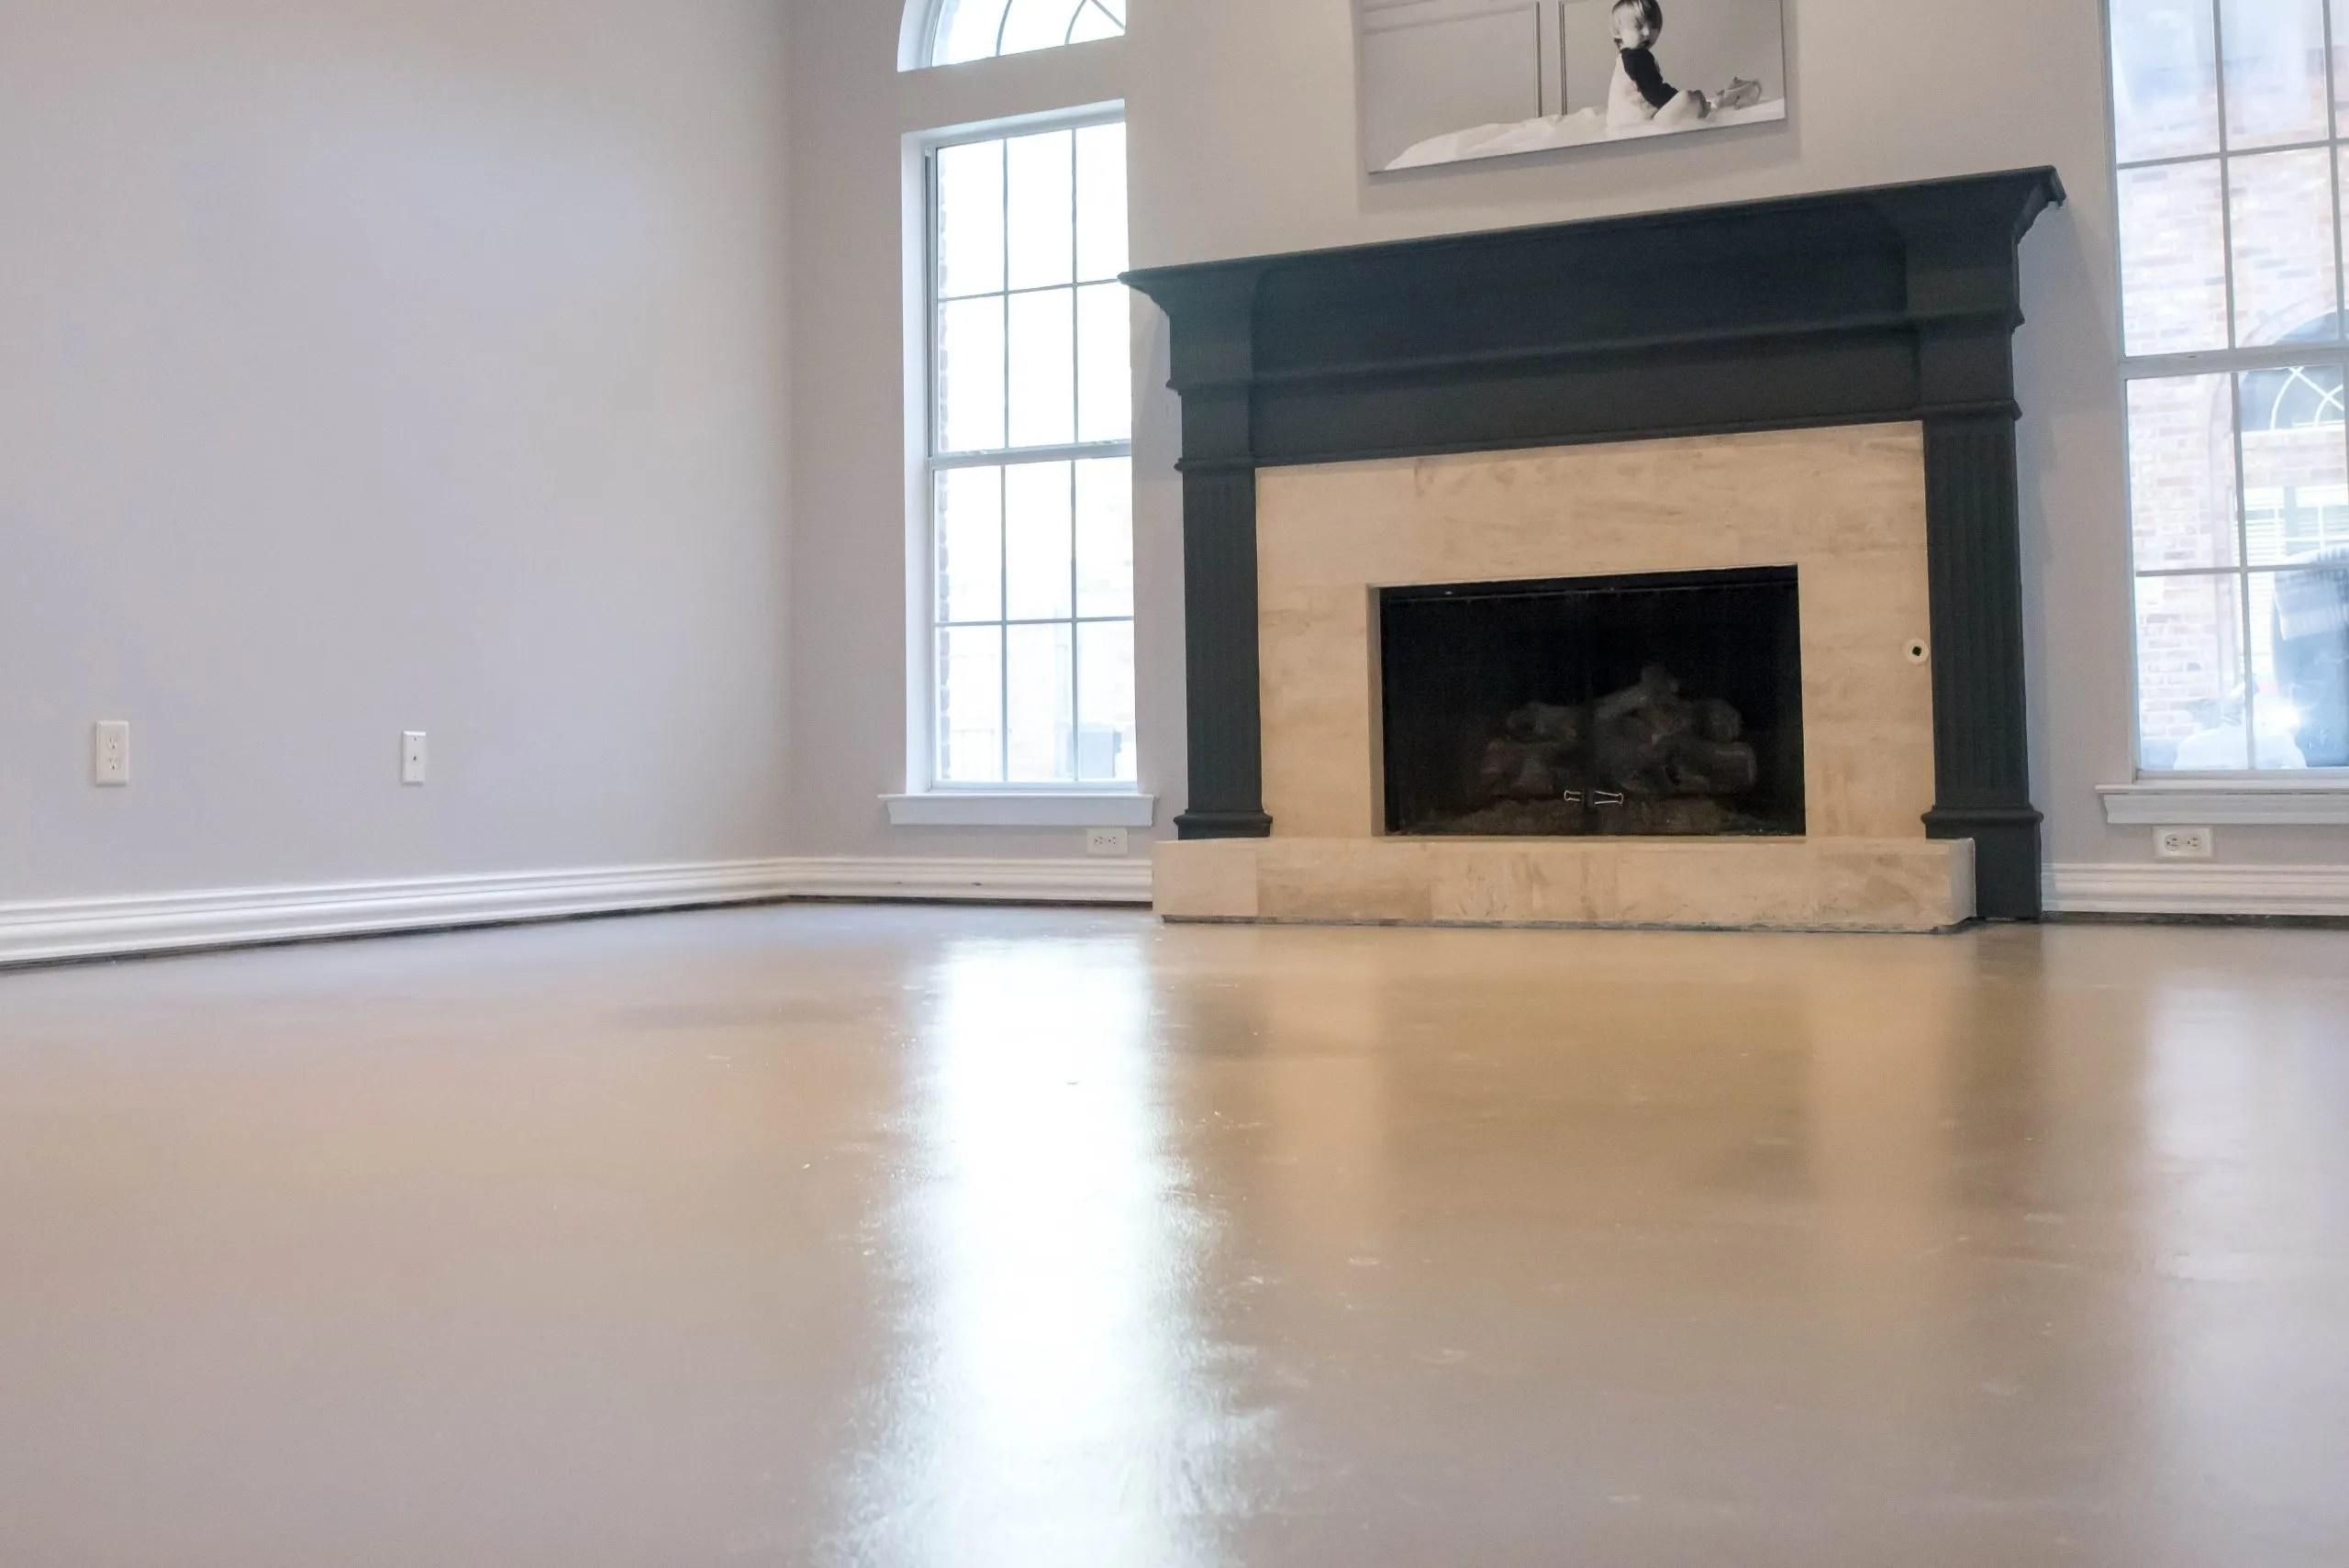 Master Bedroom Redo From Carpet to Concrete Floor